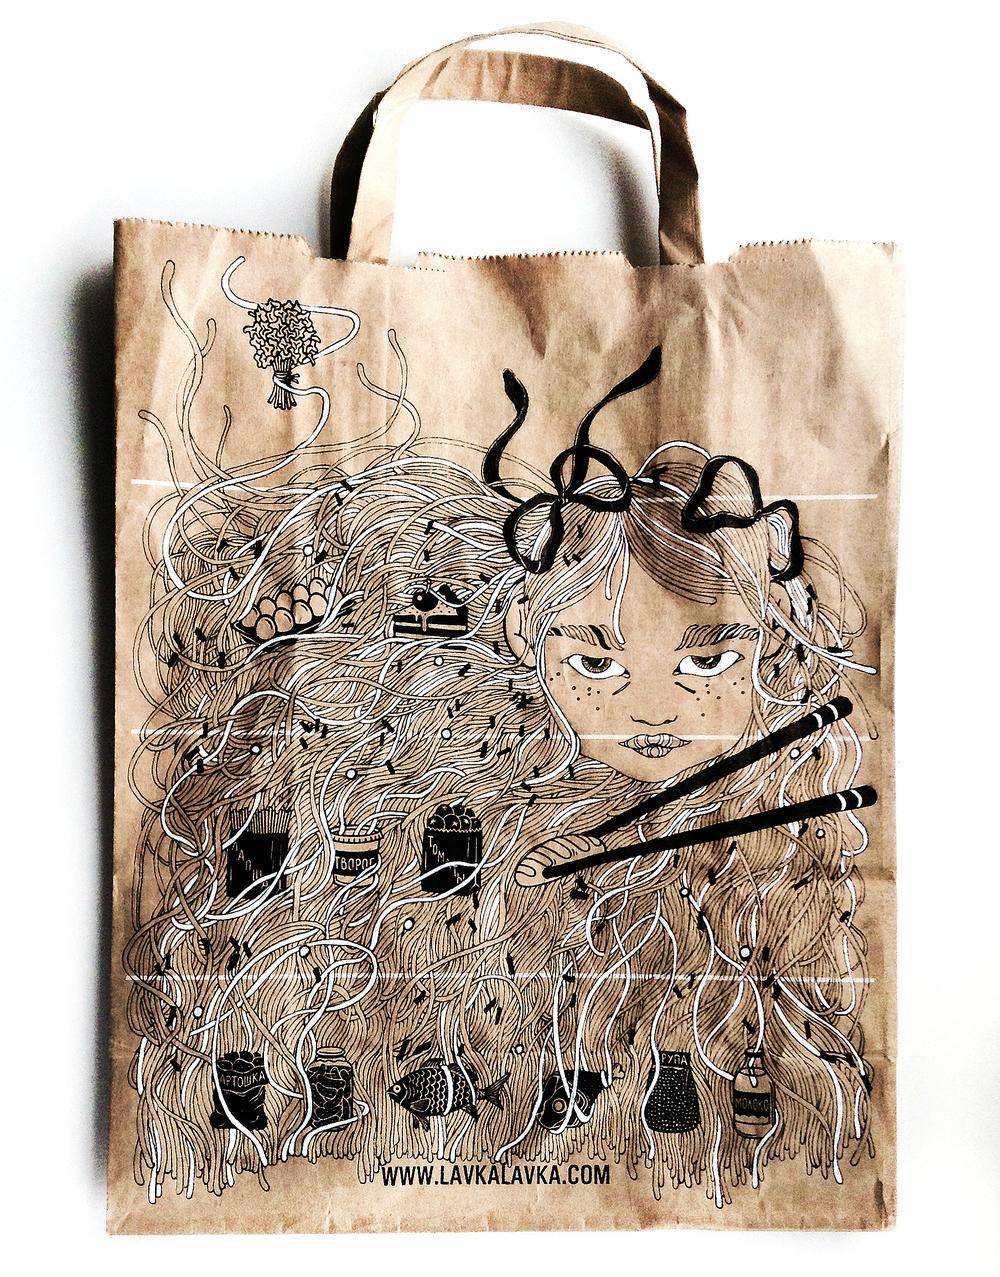 Lavka Lavka paper bag transformed